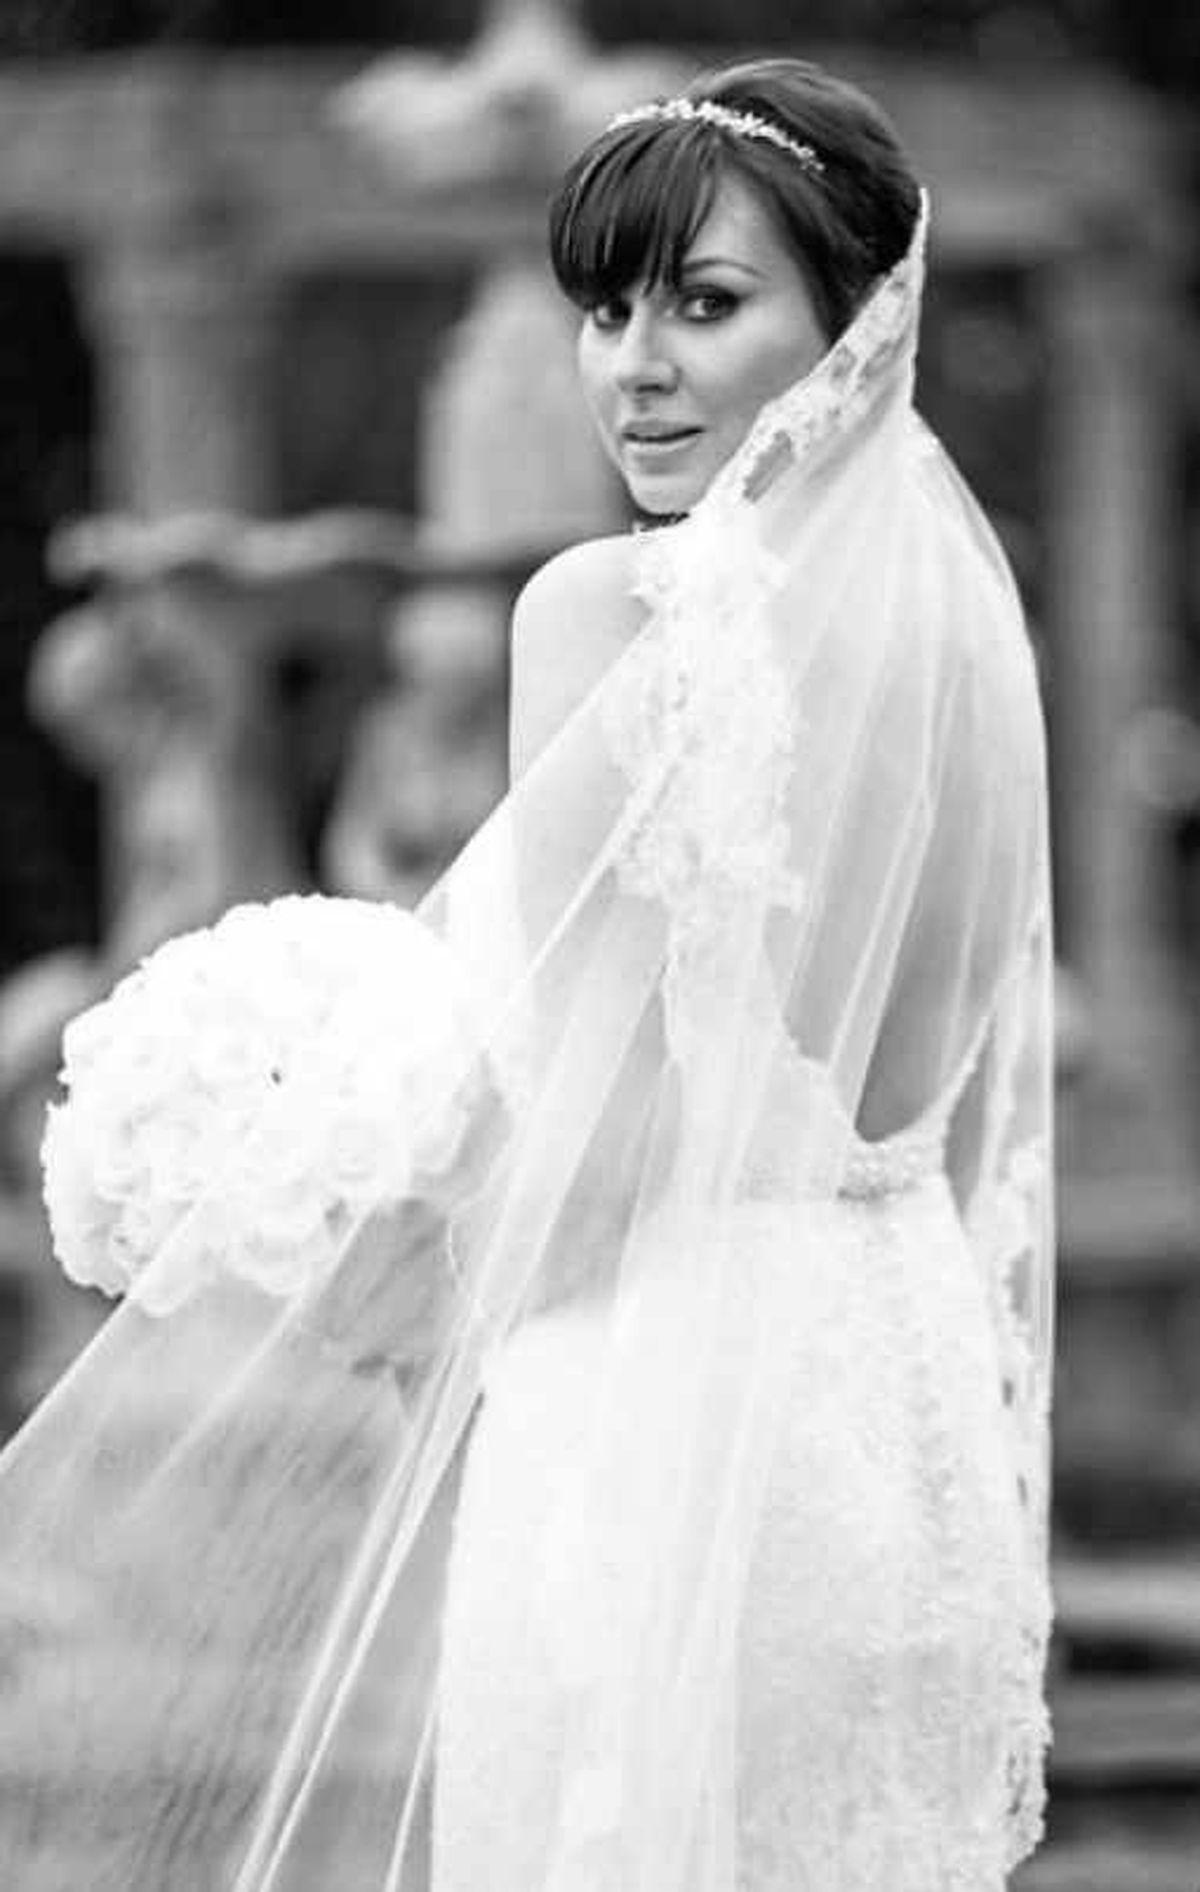 'Stunning' – tragic bride Lucy Guy on her wedding day